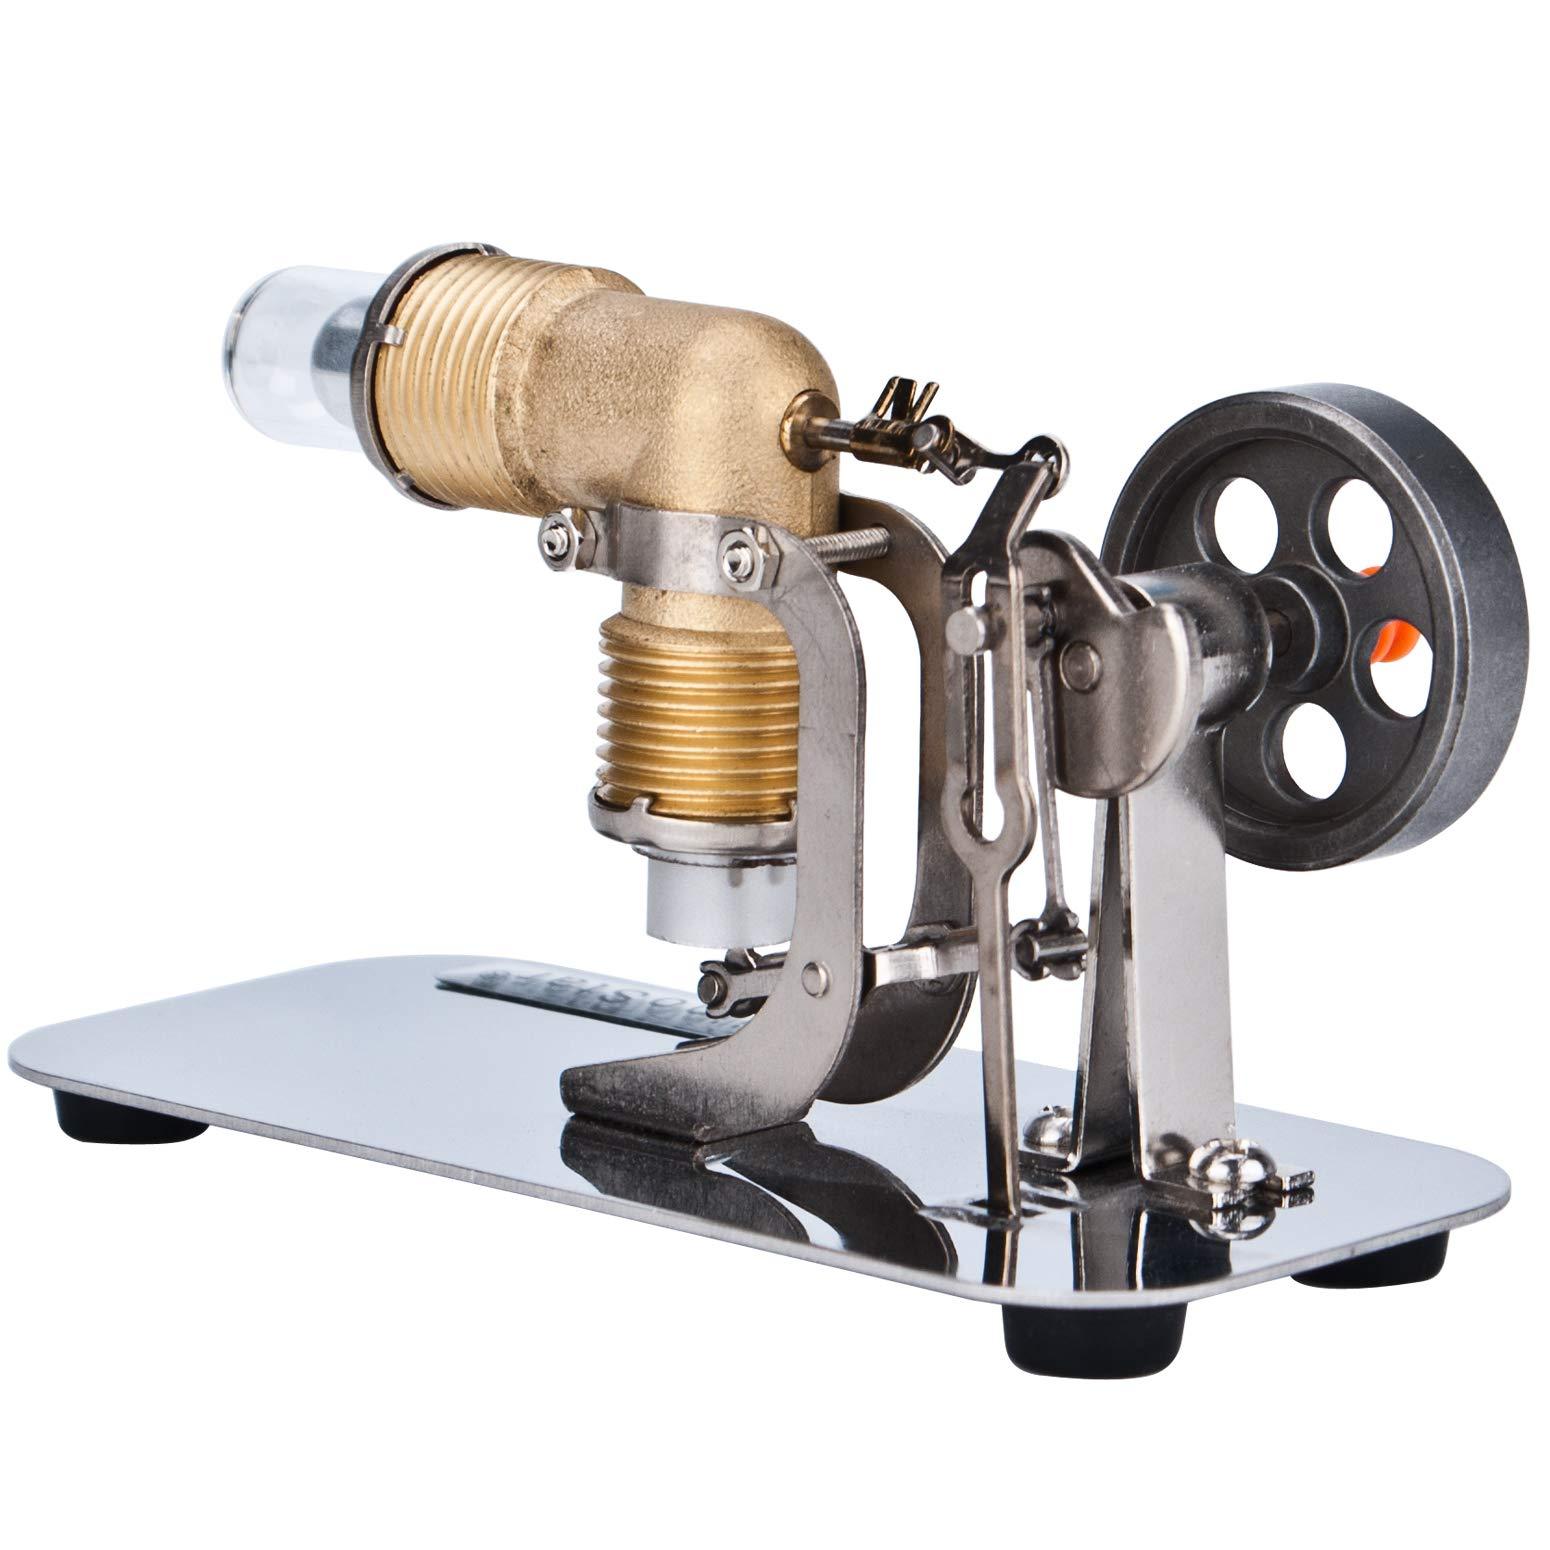 DjuiinoStar Mini Hot Air Stirling Engine: A High Performance Pocket-Sized Working Model by DjuiinoStar (Image #5)